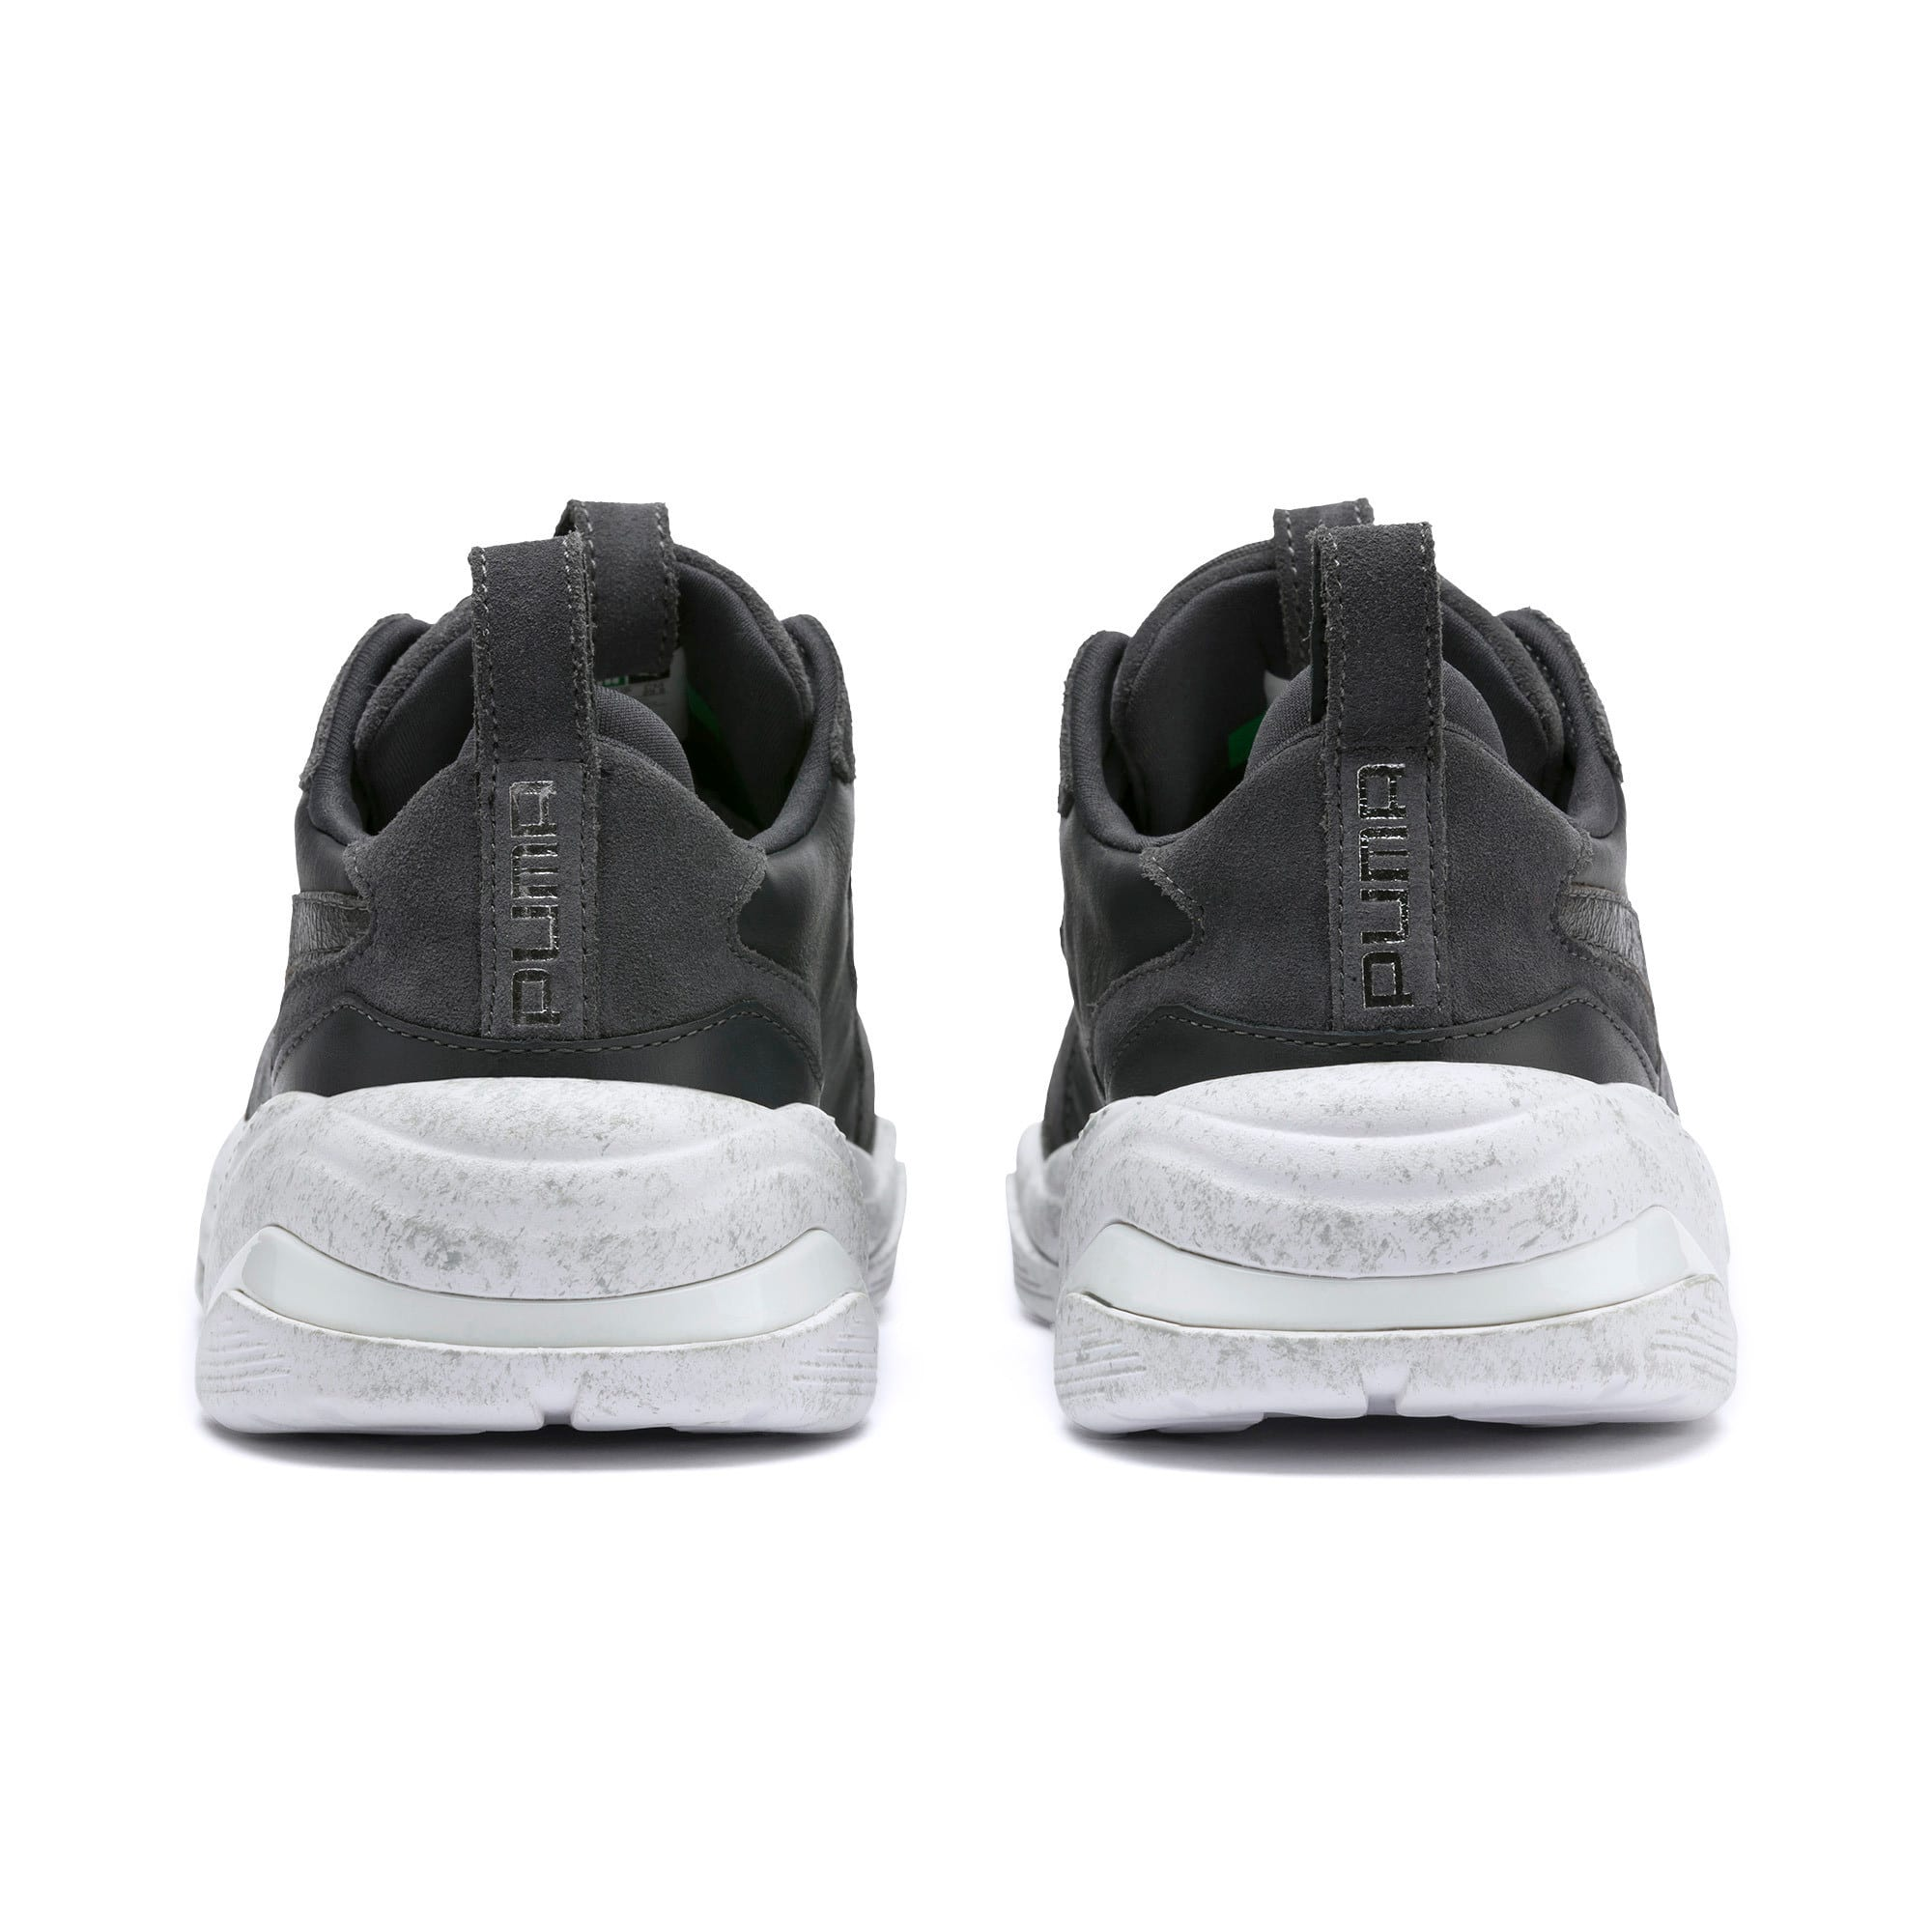 huge discount 8b6ea 60f3f Thunder Distressed Women's Sneakers